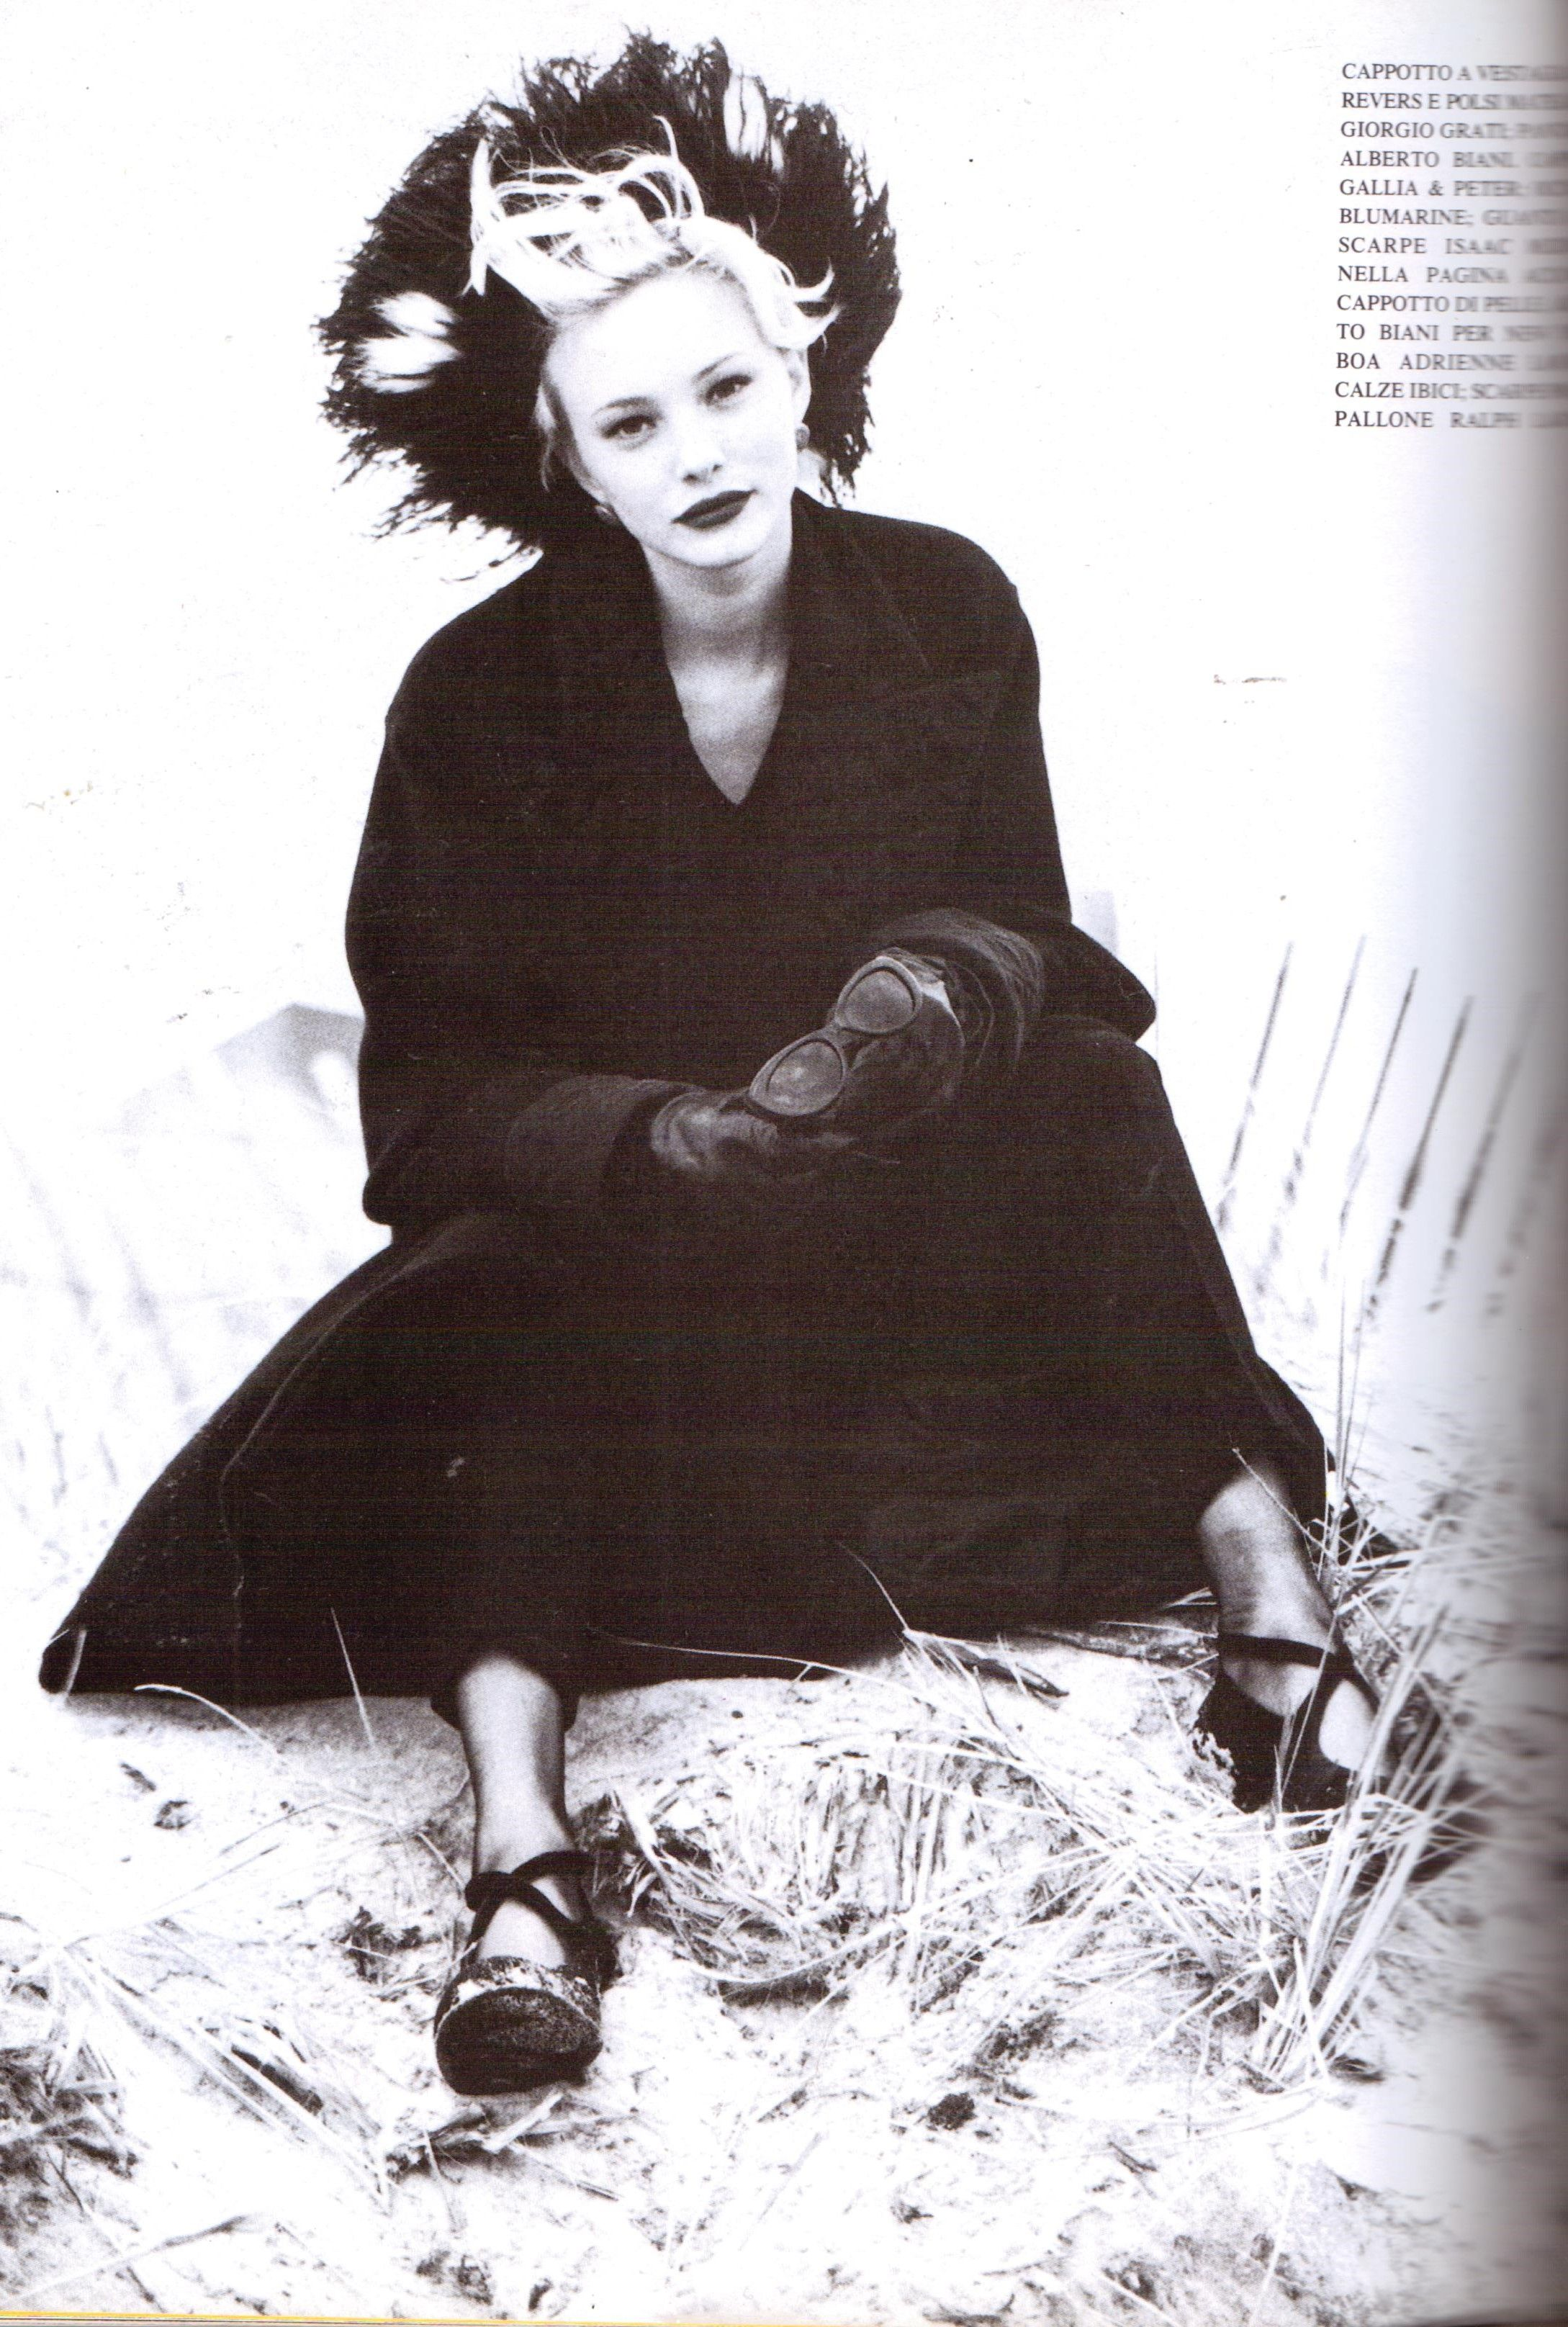 ☆ Jaime Rishar   Photography by Arthur Elgort   For Vogue Magazine Italy   August 1994 ☆